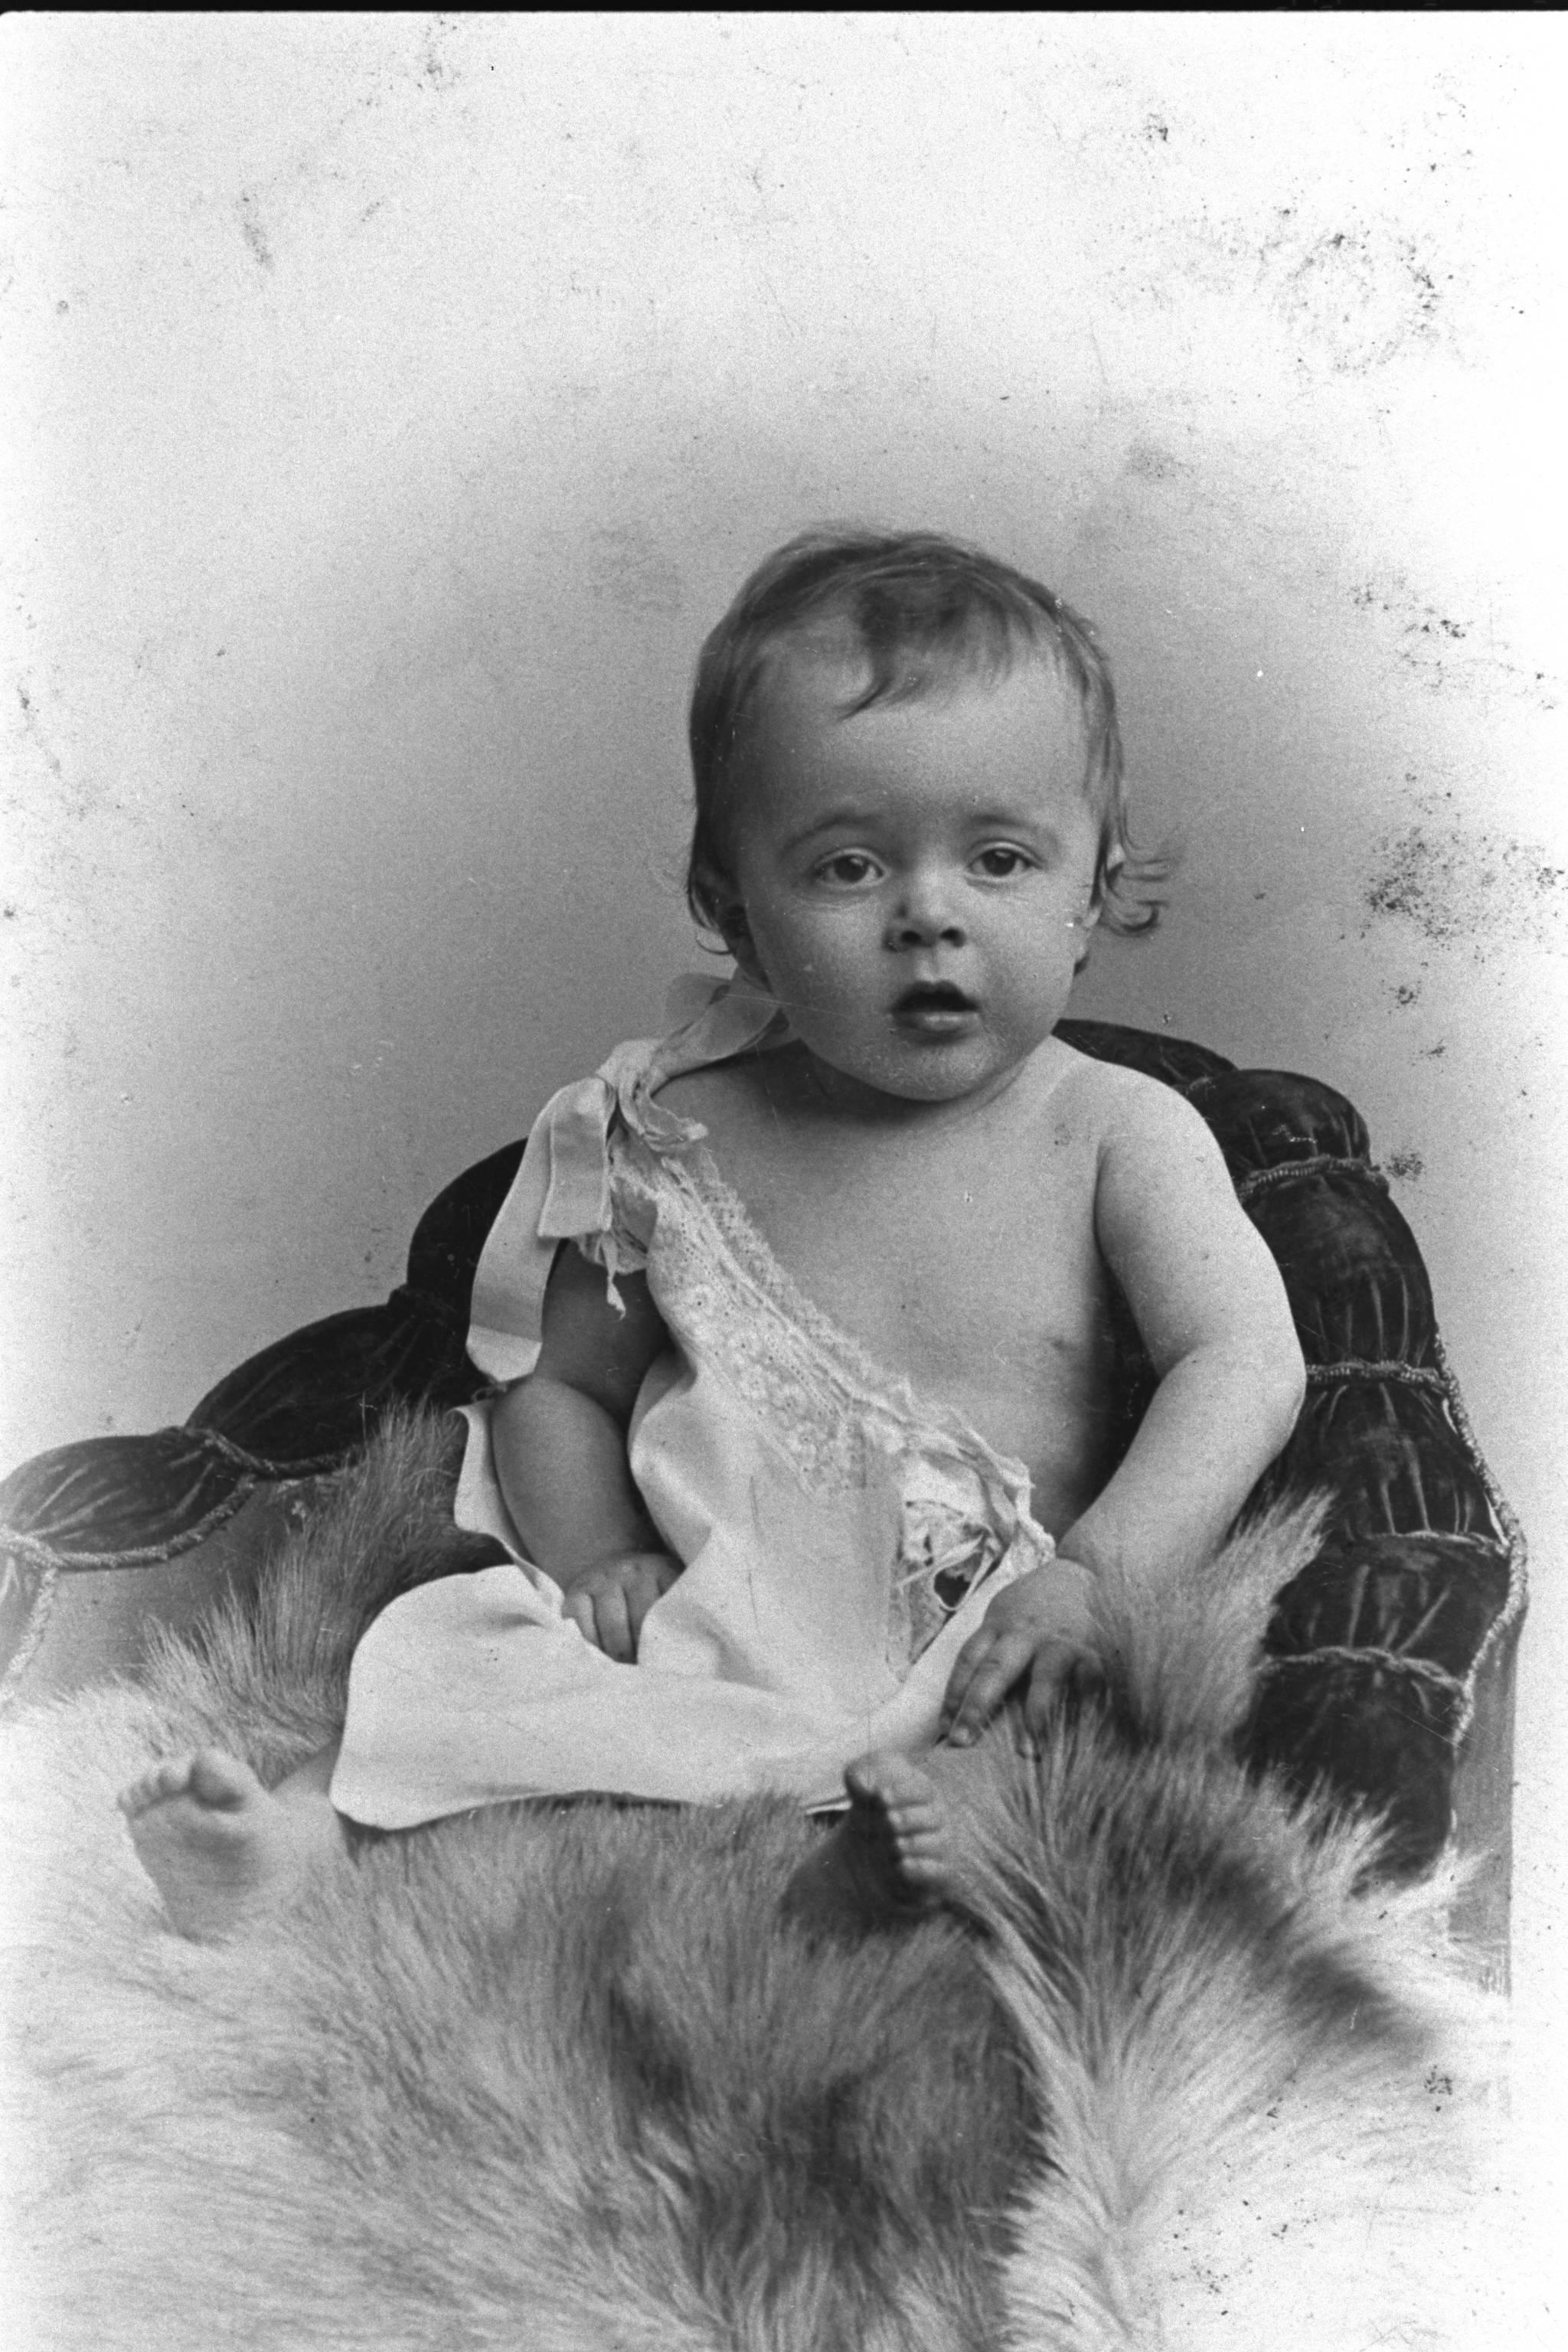 Mexican Baby Boy Clothes